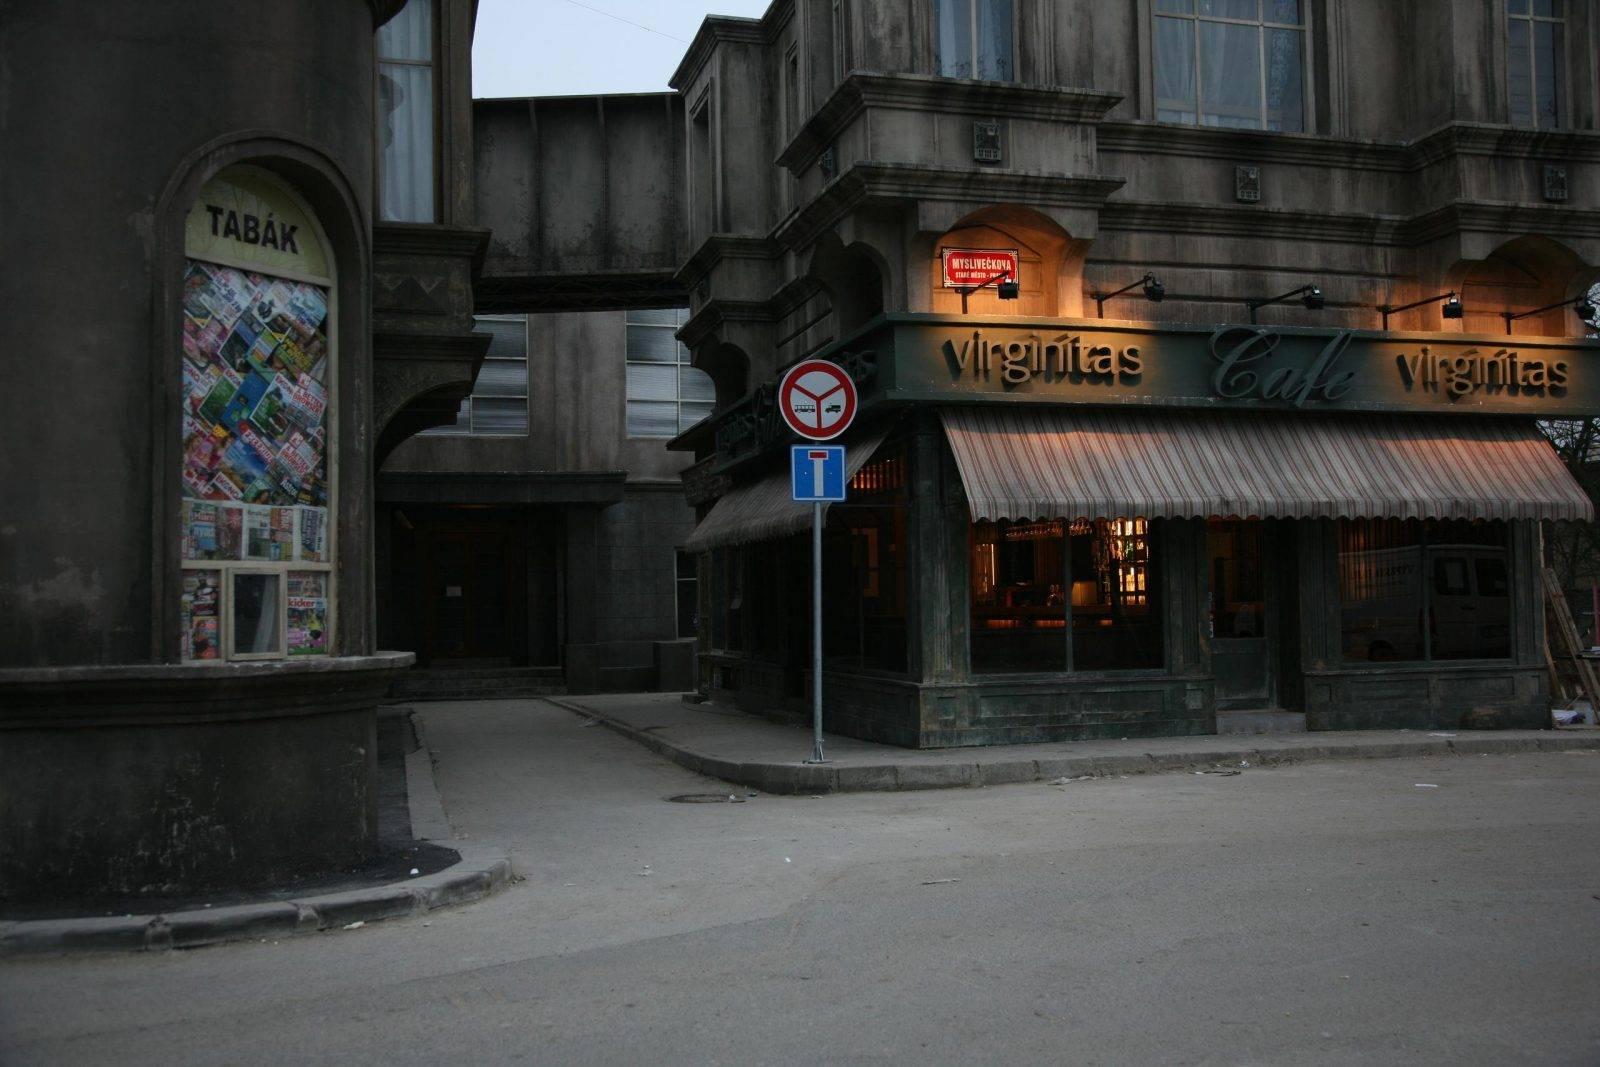 Policajti zcentra by Jan Kadlec